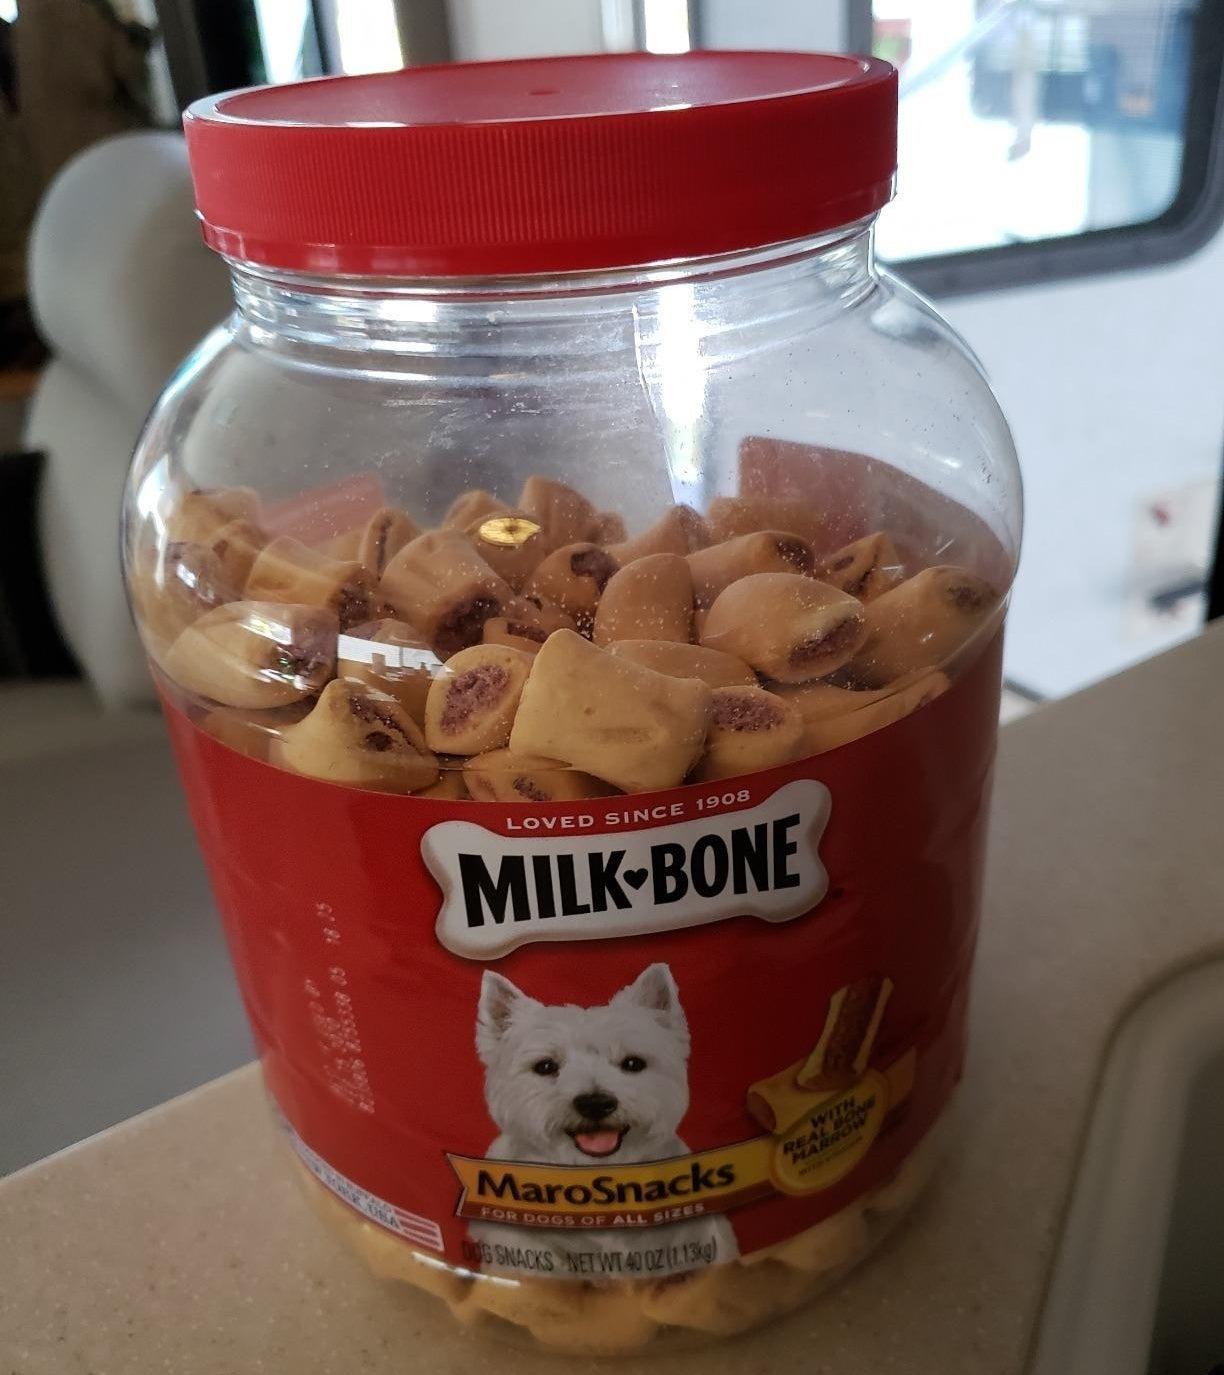 reviewer photo of the Milk Bone jar